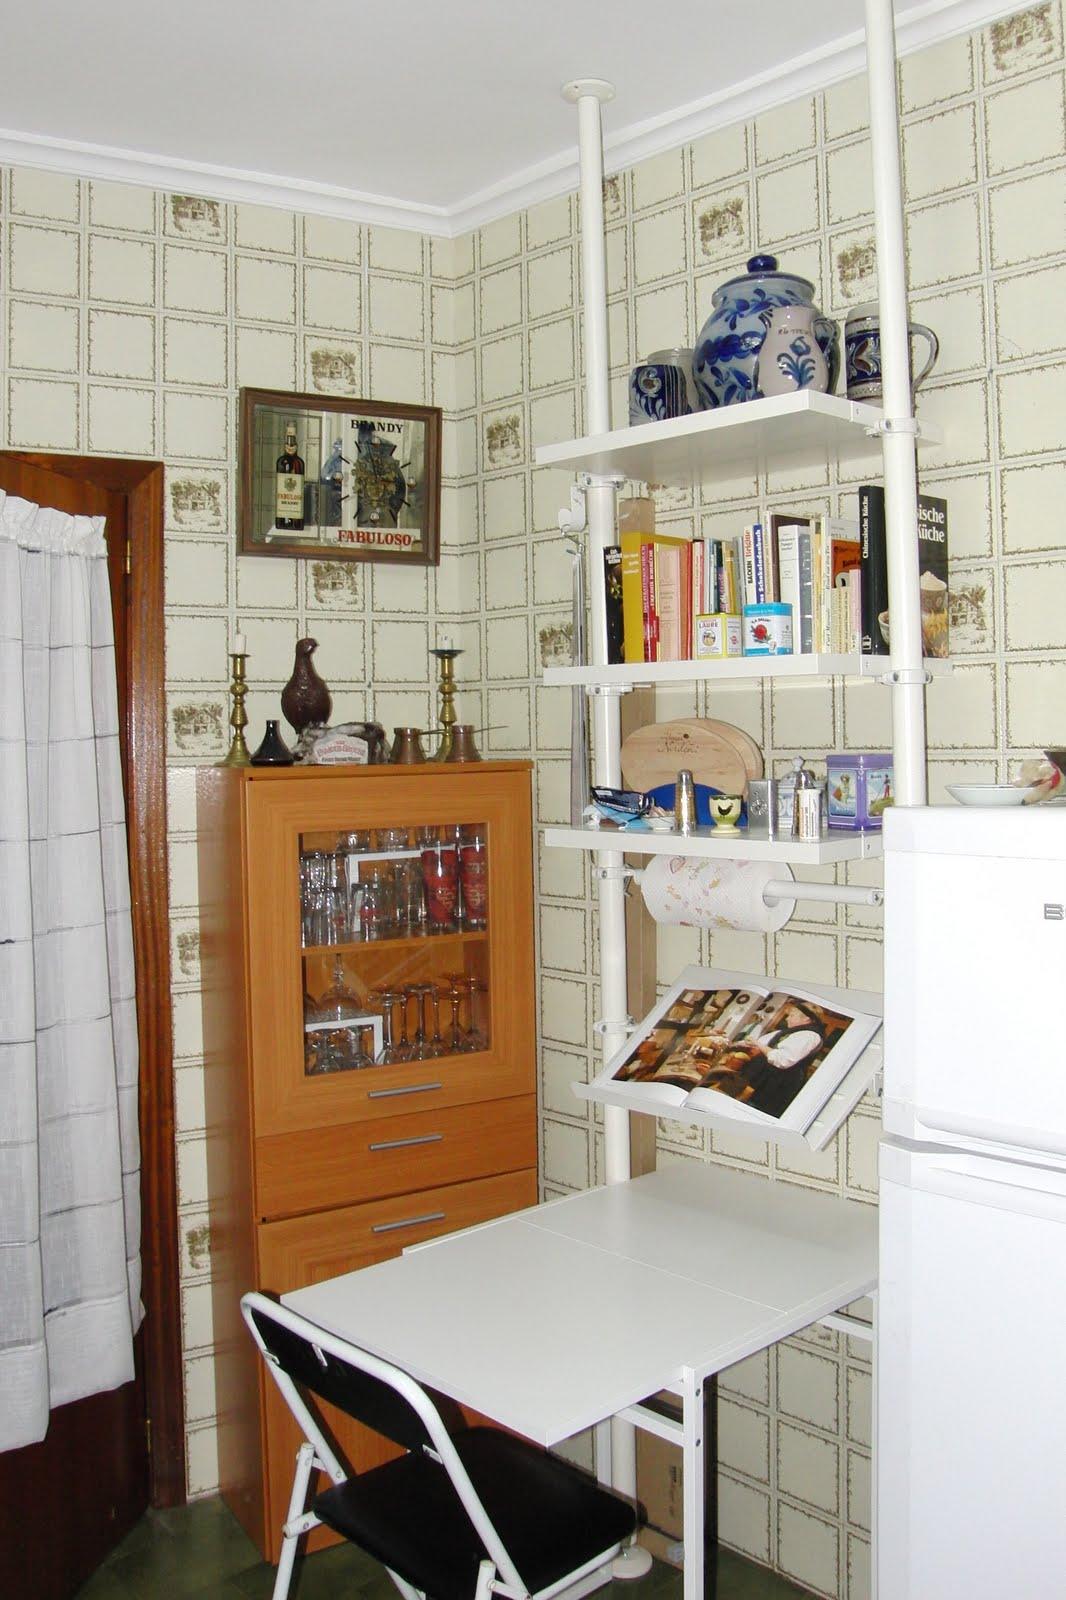 susannes sammelsurium neue k che. Black Bedroom Furniture Sets. Home Design Ideas